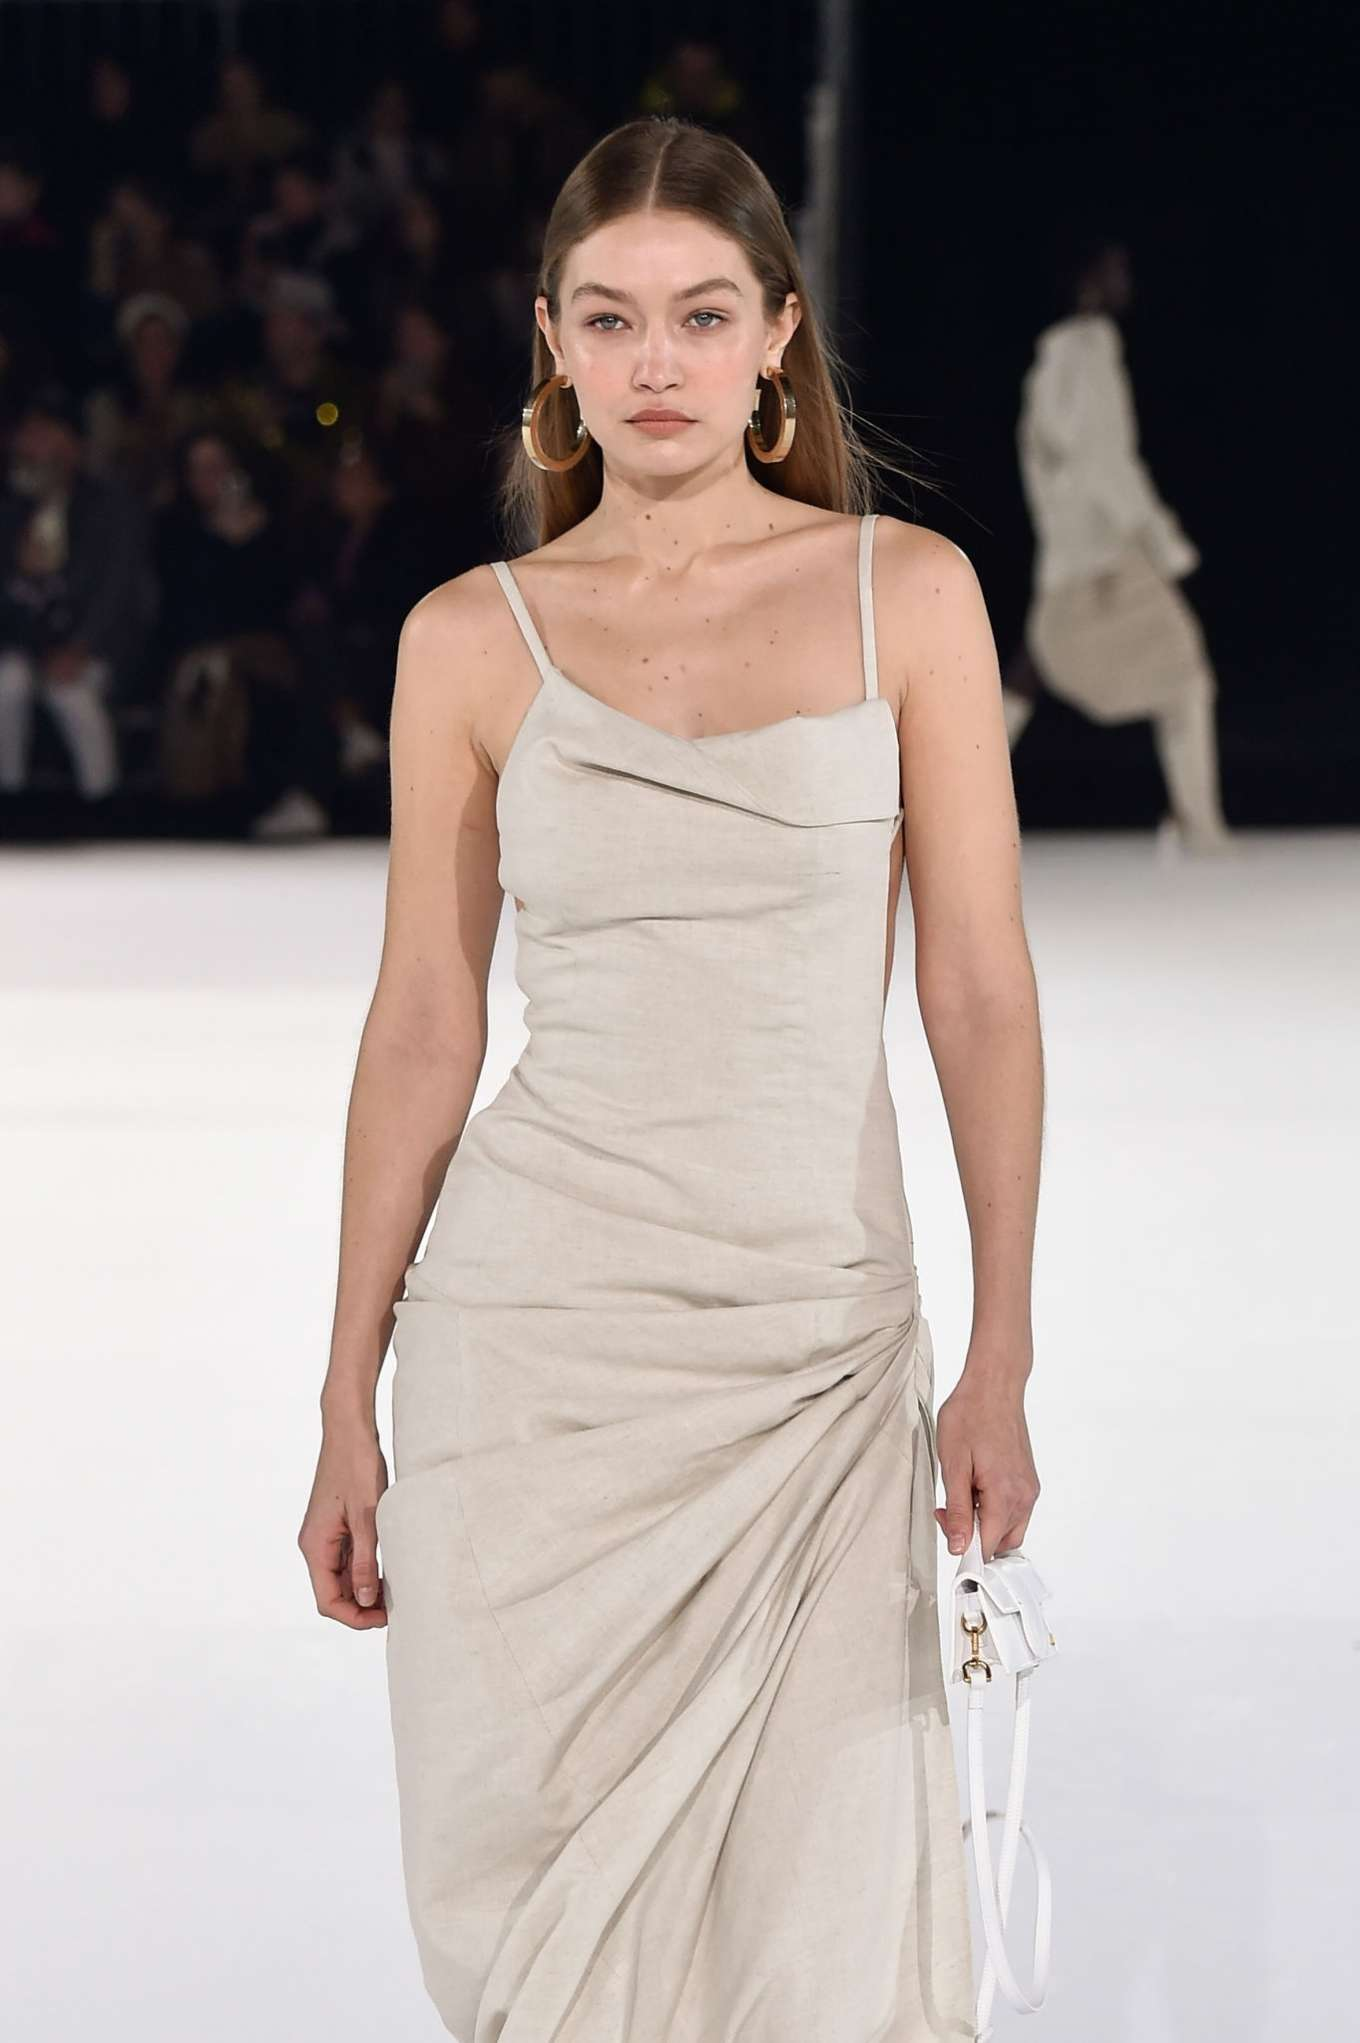 Gigi Hadid - Jacquemus Menswear Runway Show 2020 in Paris